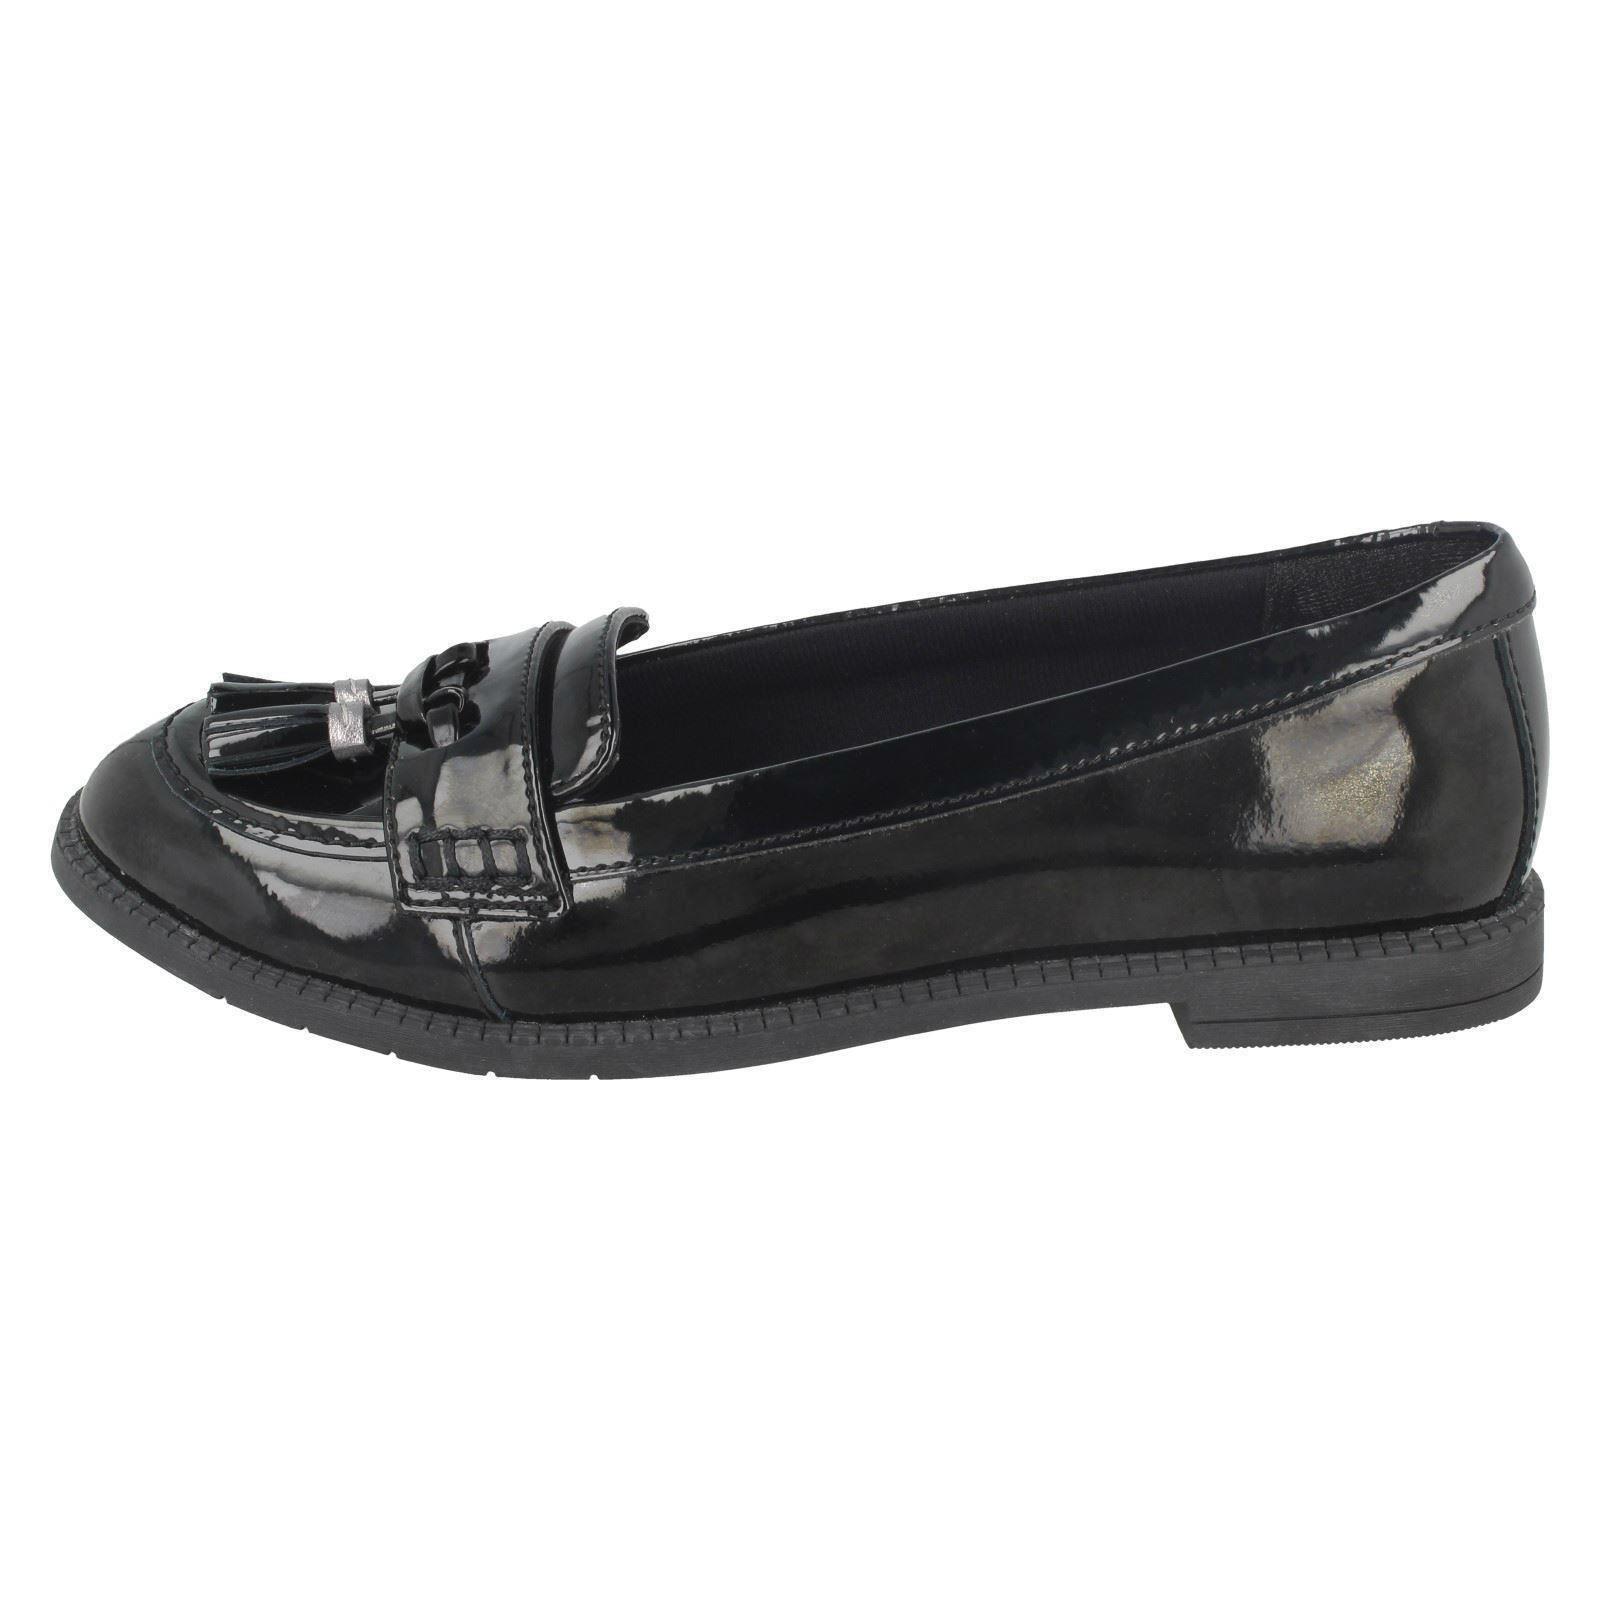 "Filles Clarks Formal slip on school Chaussures /""Preppy prix/"""